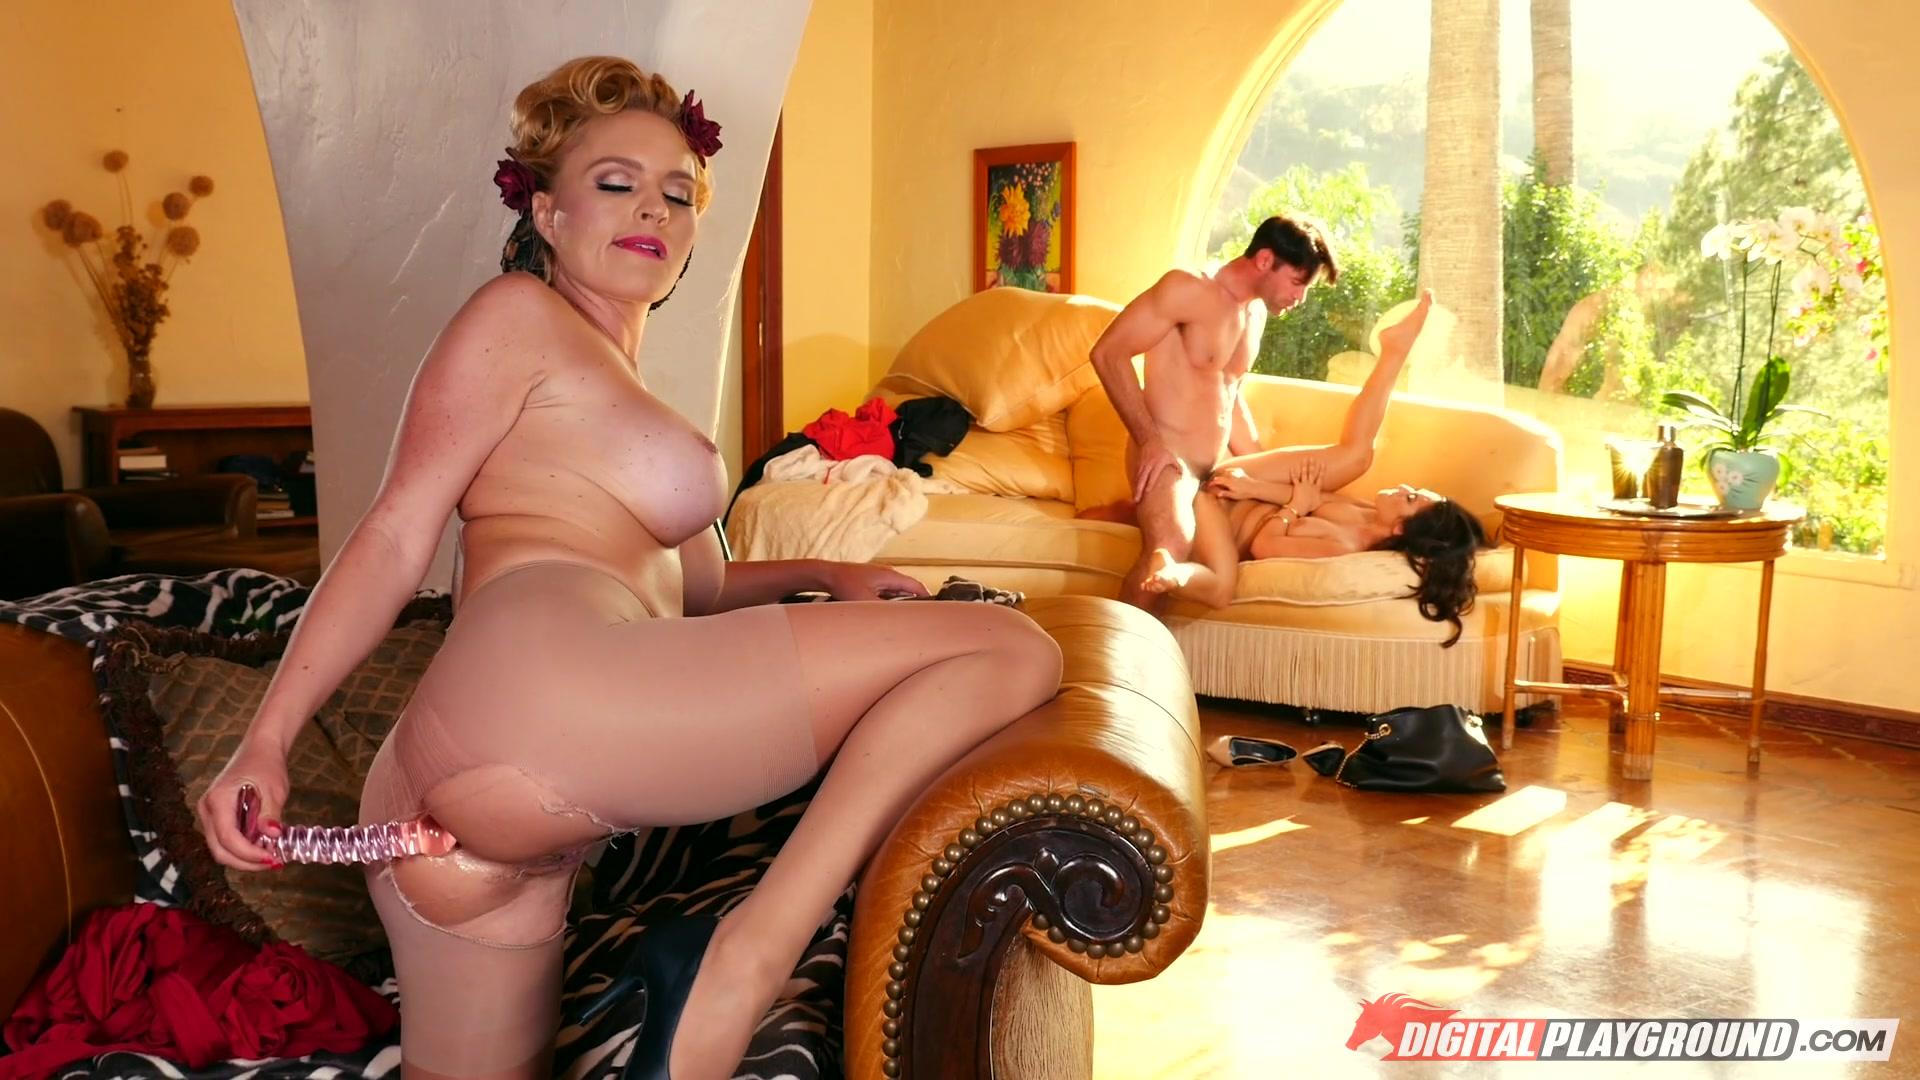 Diana scott nude